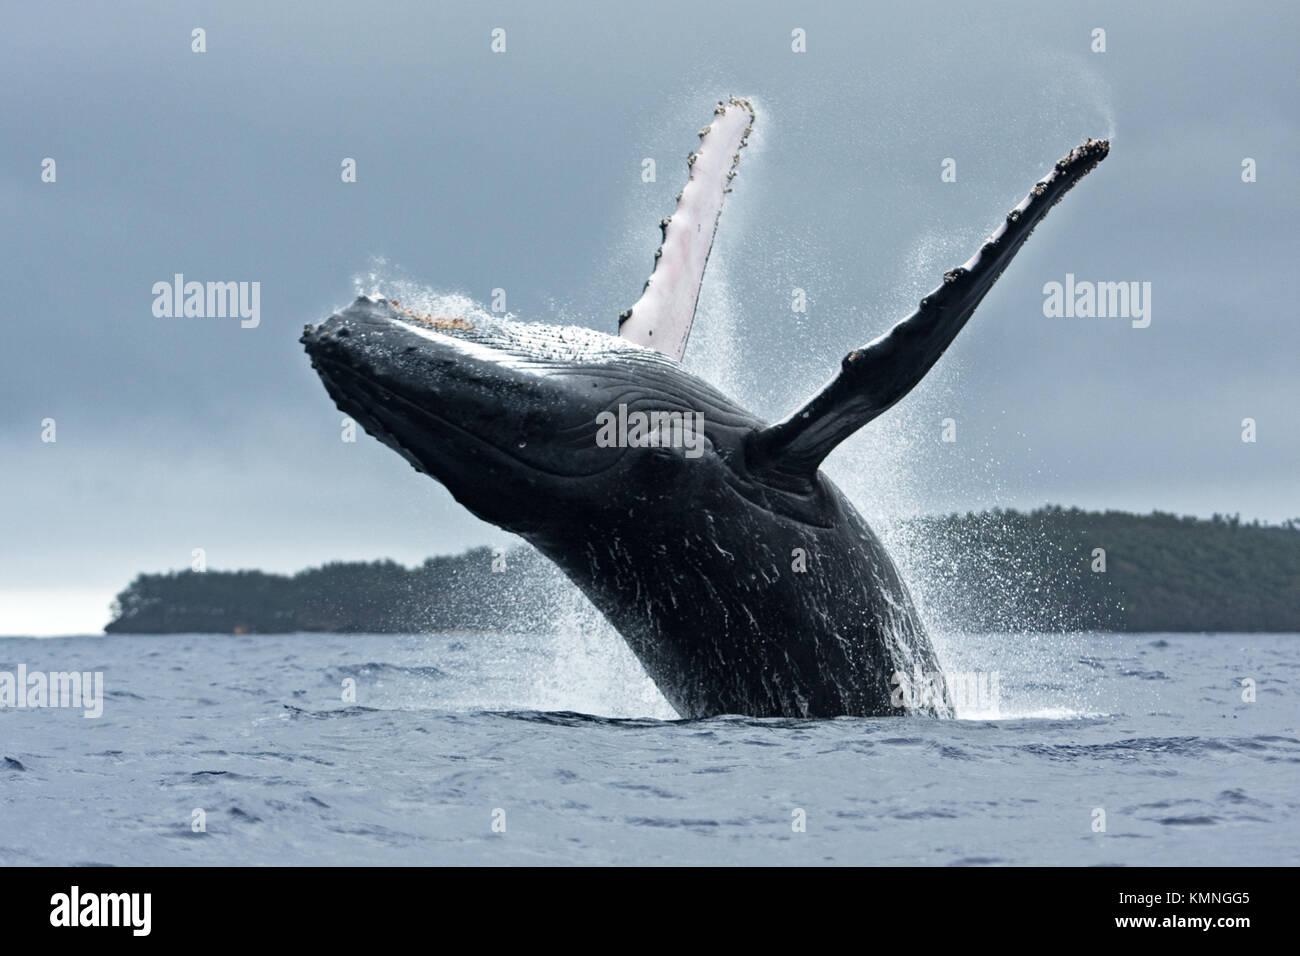 humpback whale, megaptera novaeangliae, Tonga, Vava'u island. jumping whale. Breaching whale. - Stock Image